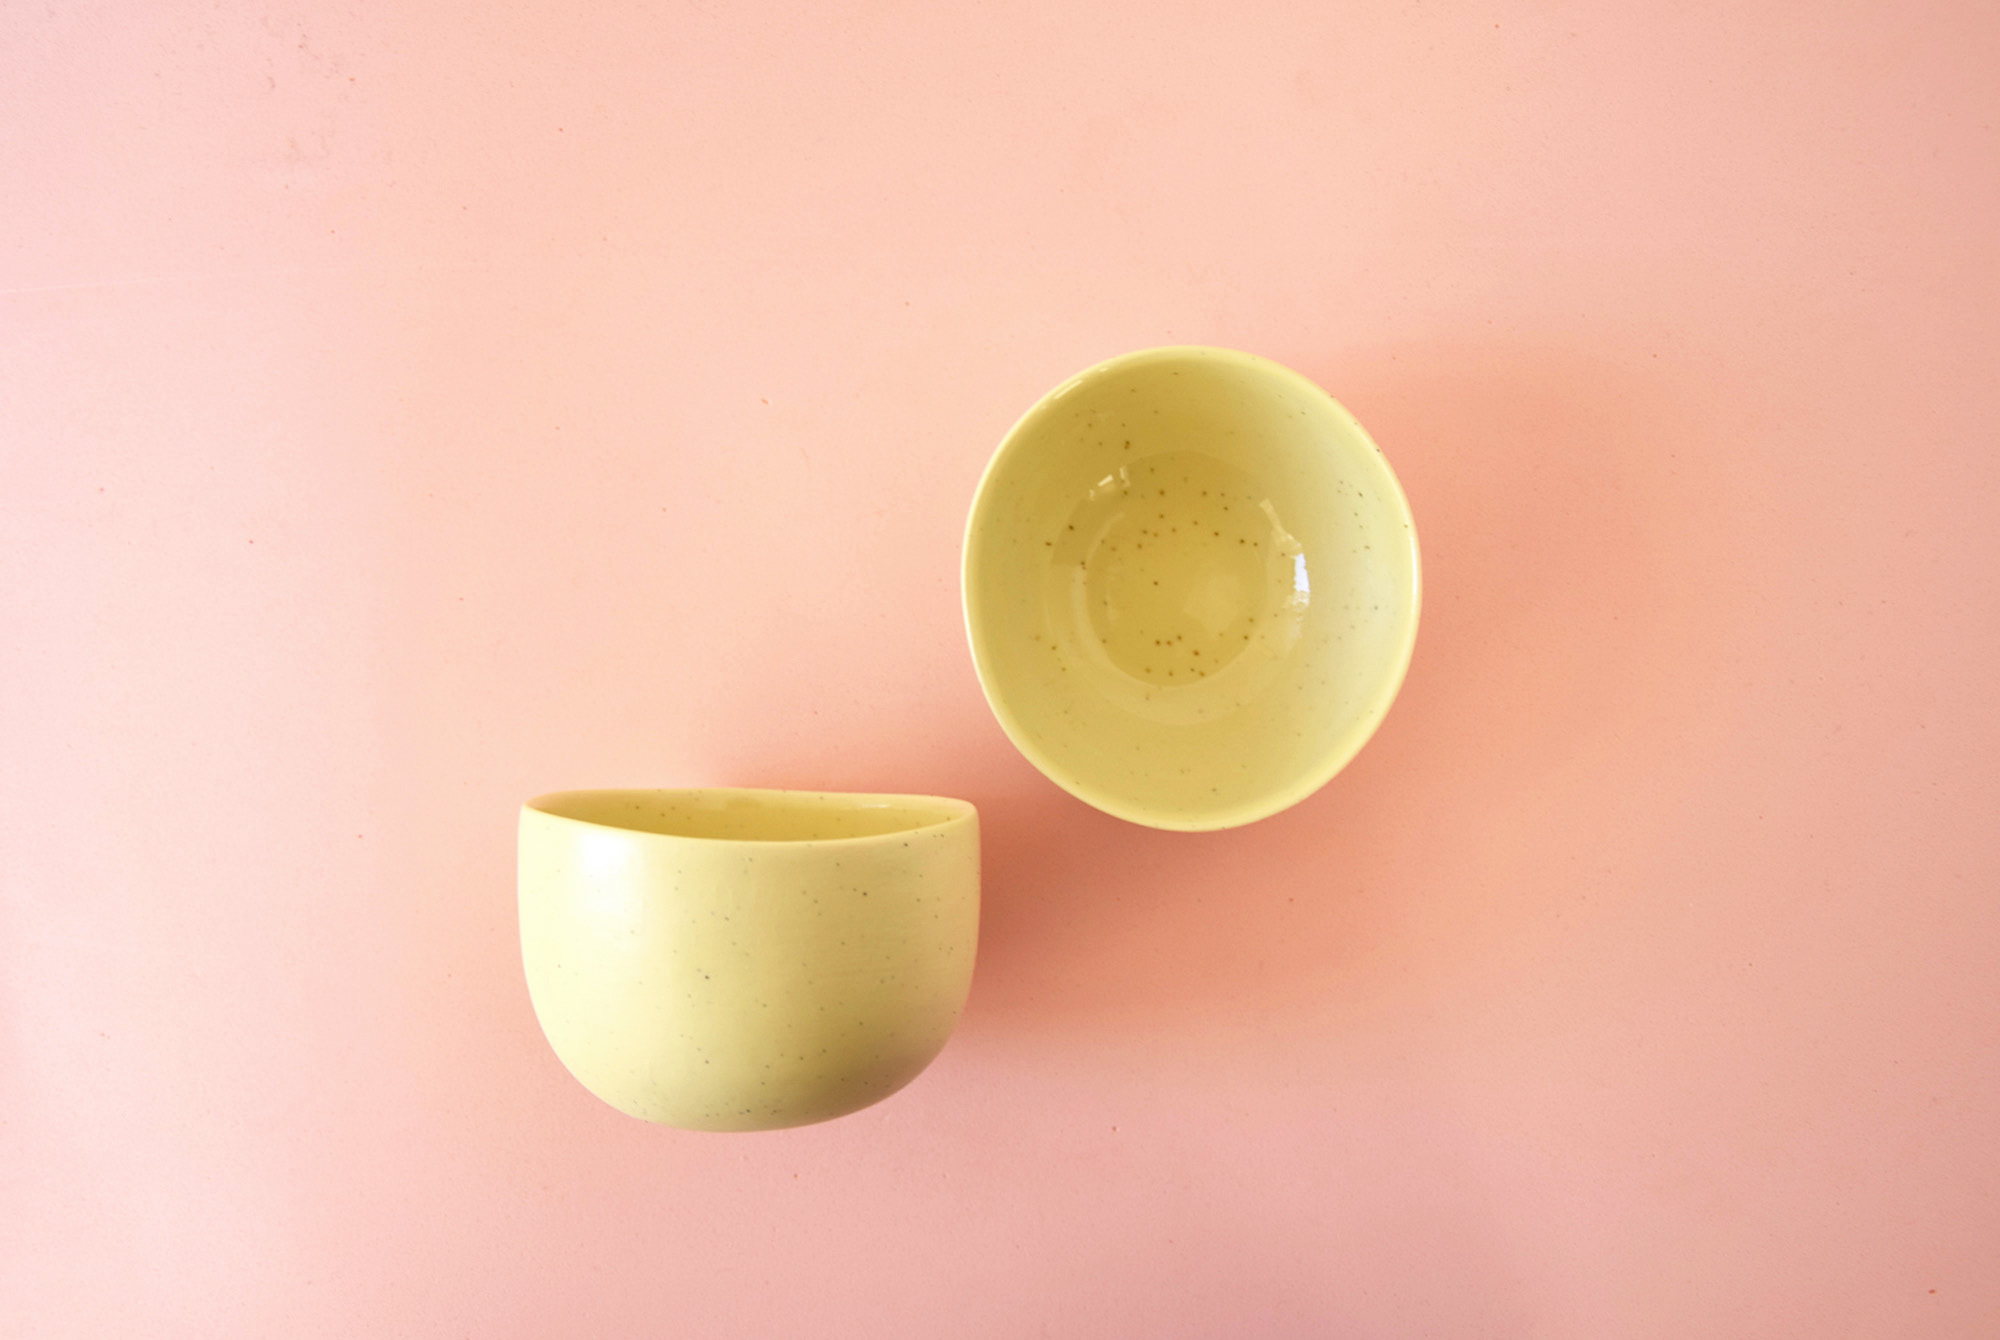 lemoncups-studiokryszewski.jpg